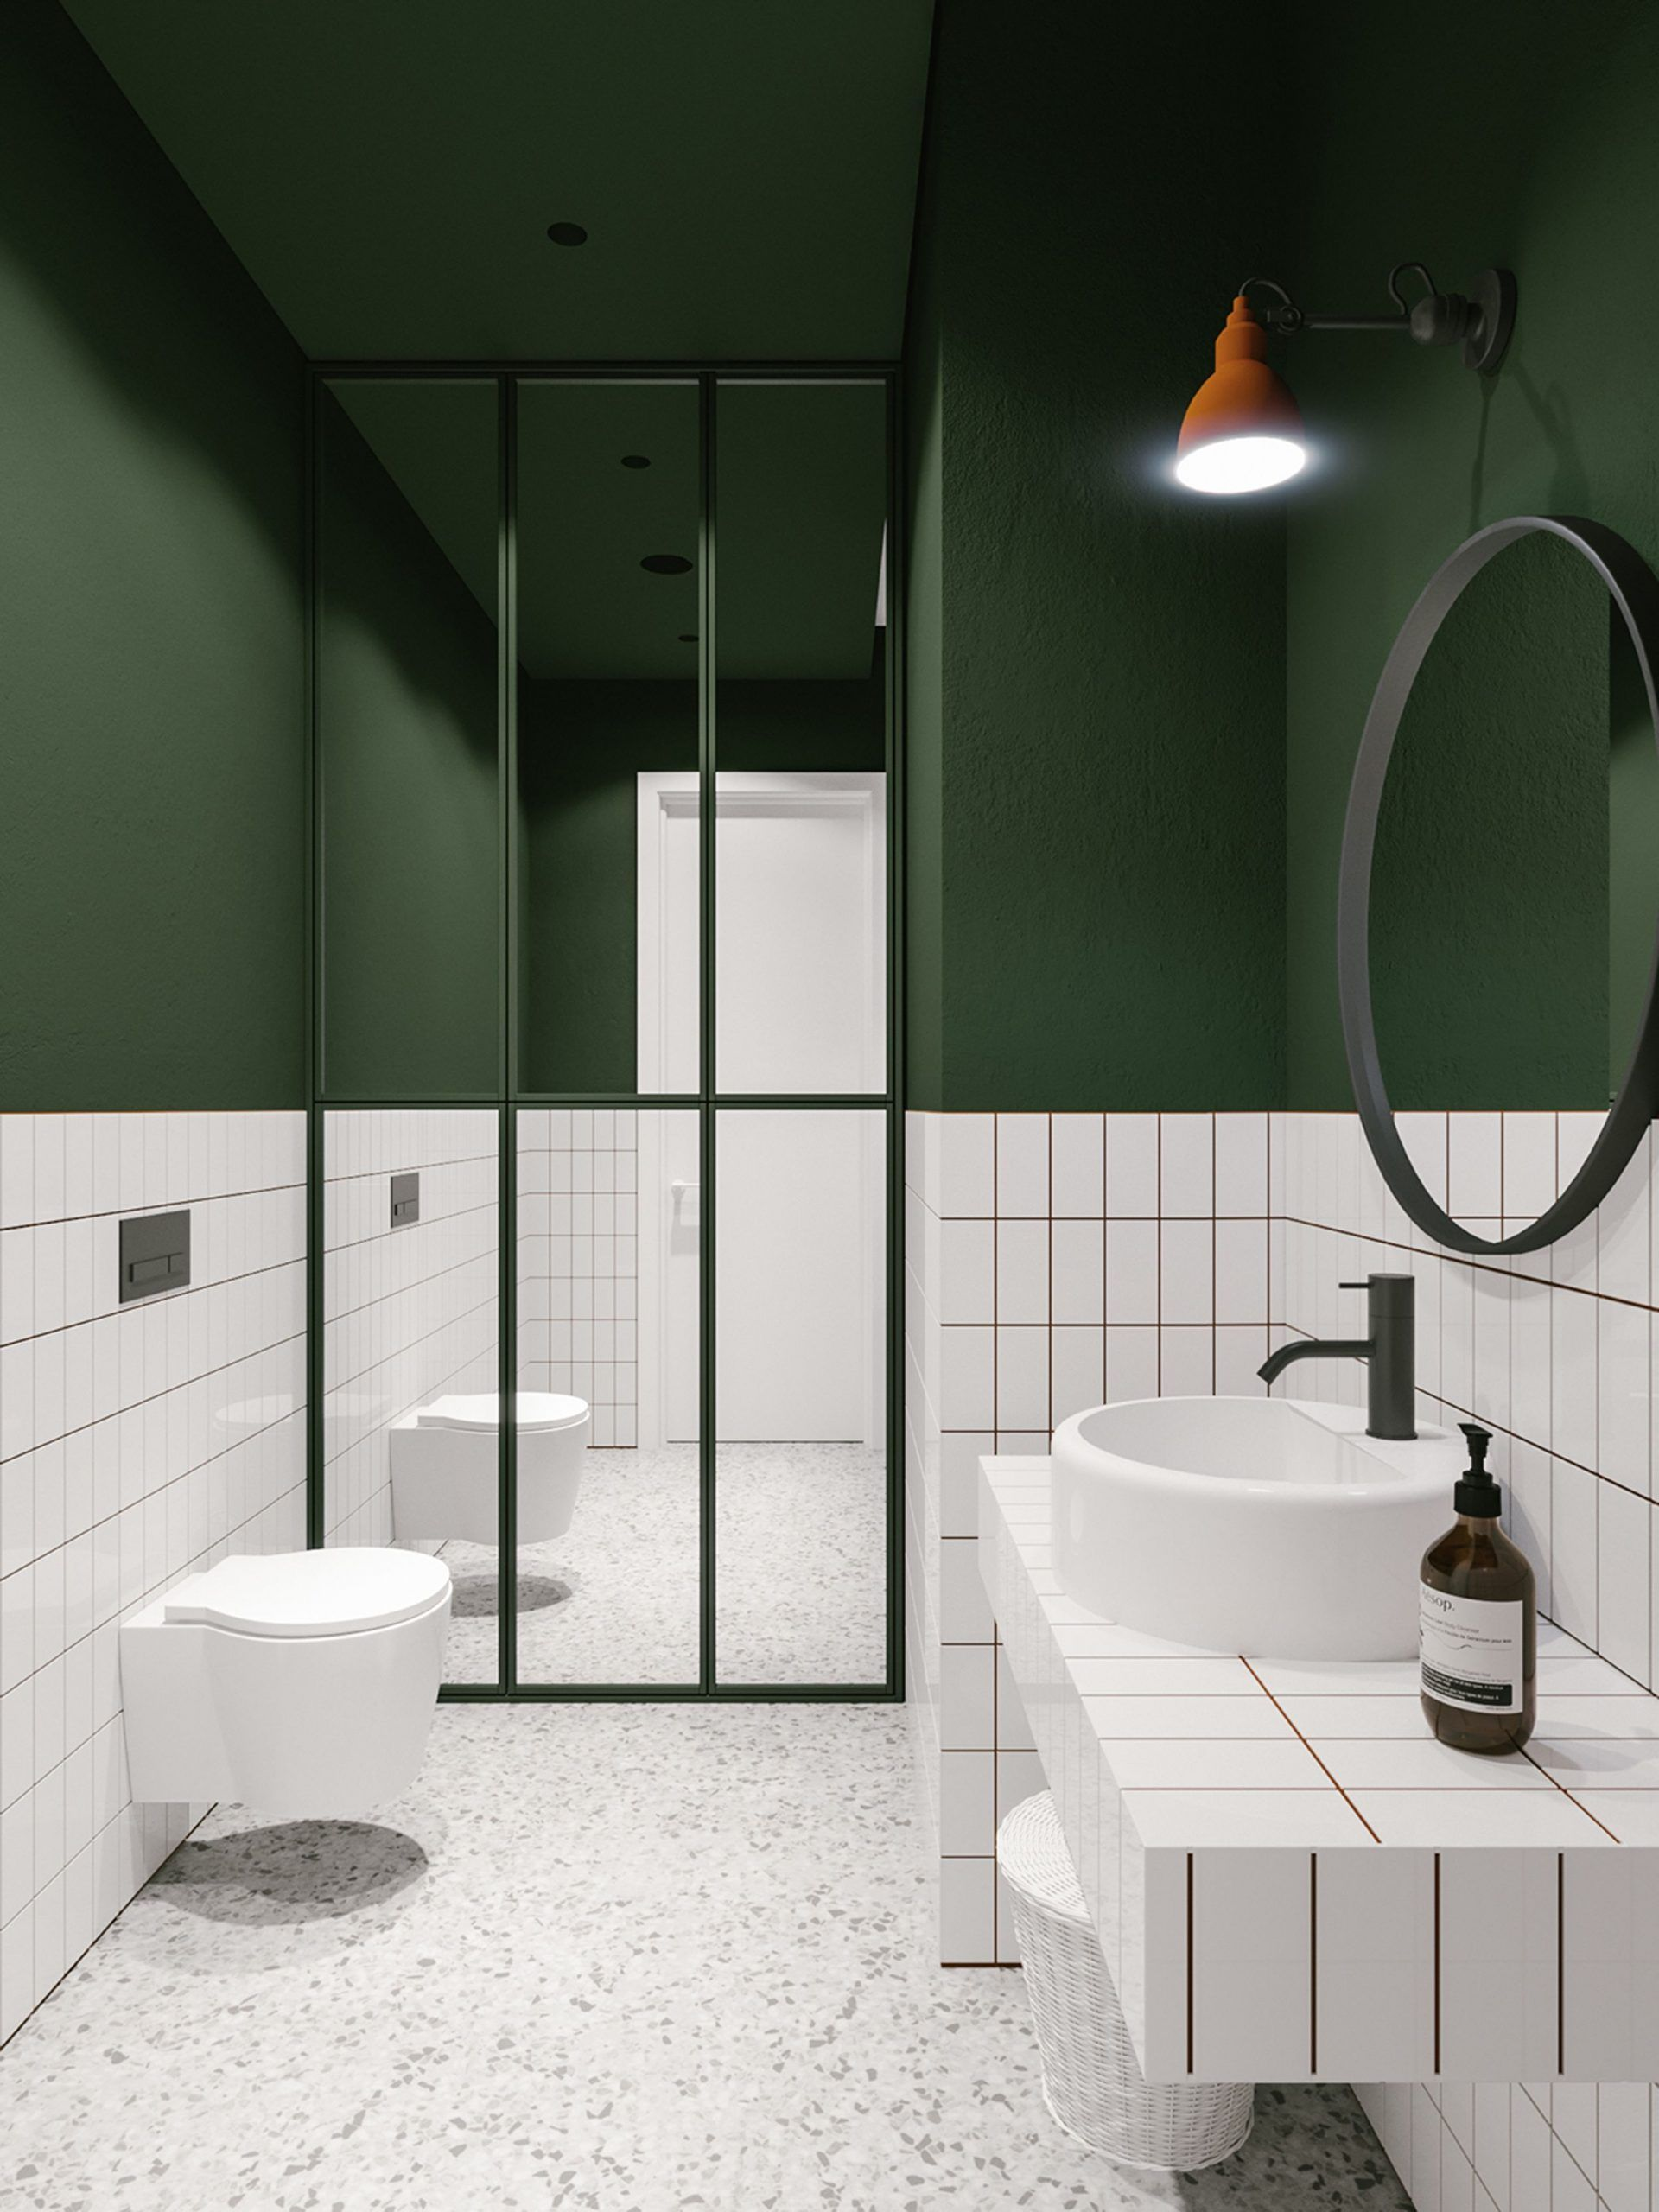 Perfect Bathroom Design Ideas With Go Green Concept 5 Ide Kamar Mandi Desain Interior Interior